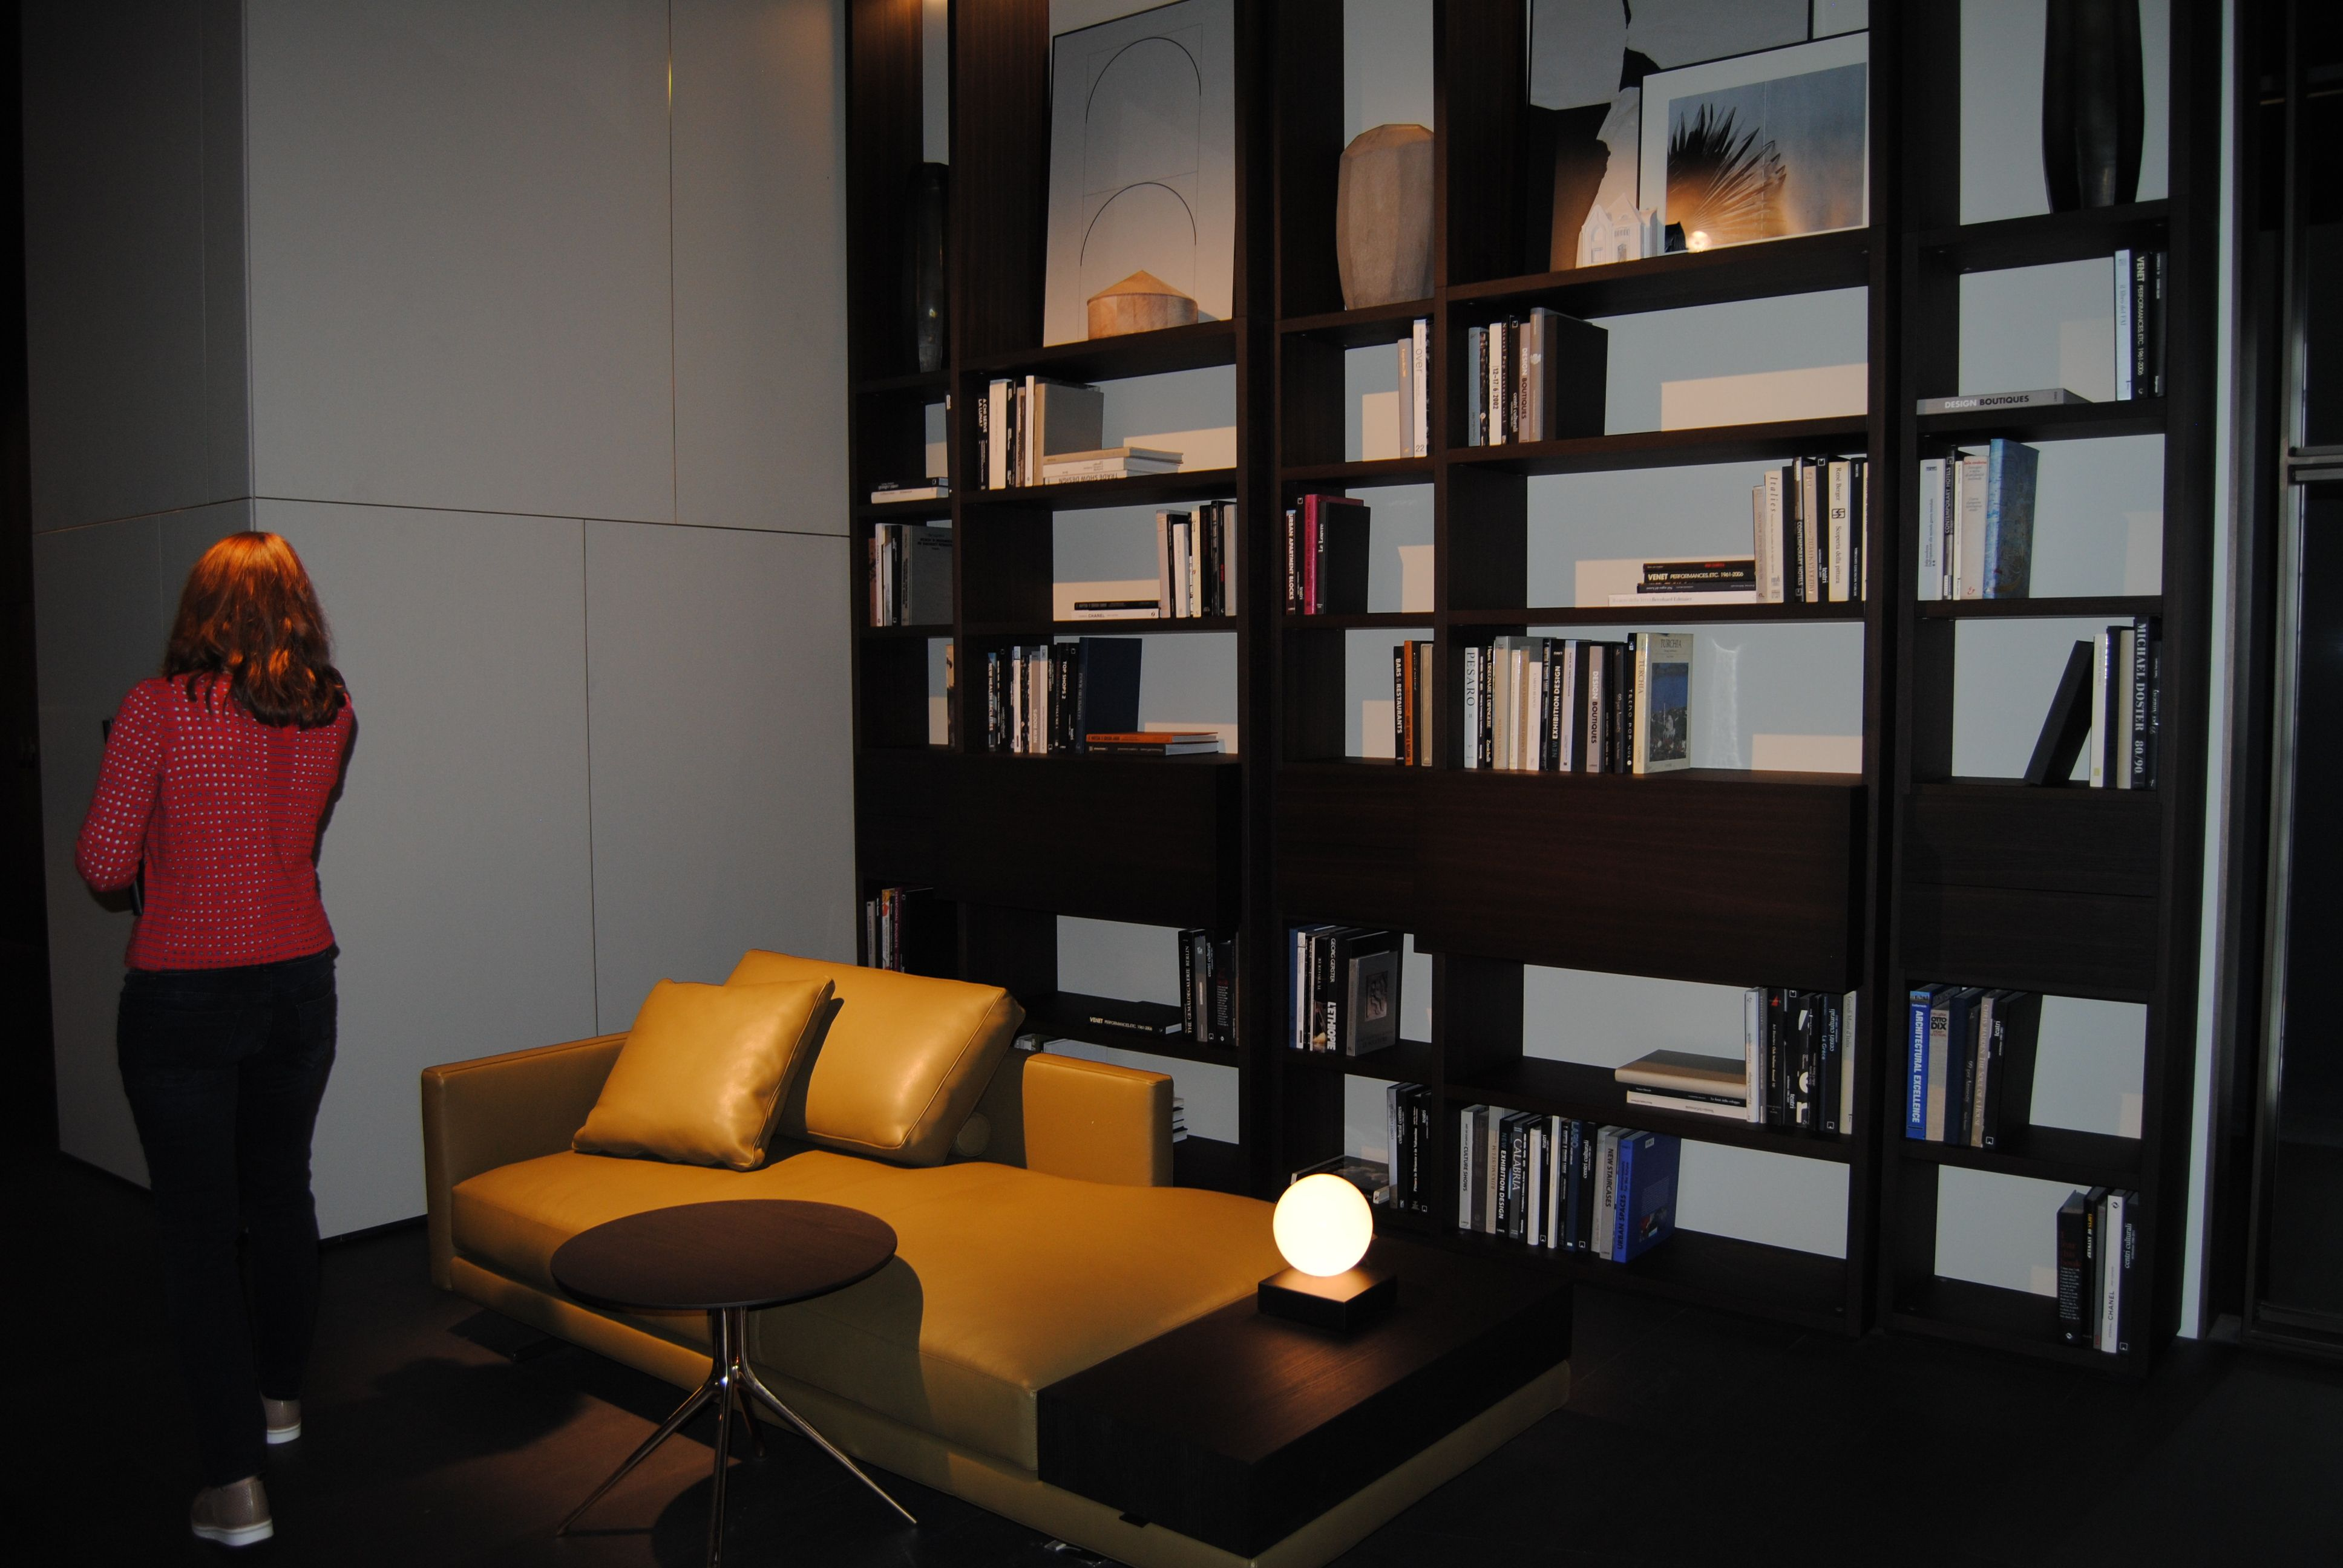 Imm Köln from lighting design to bespoke mid century furniture imm köln has